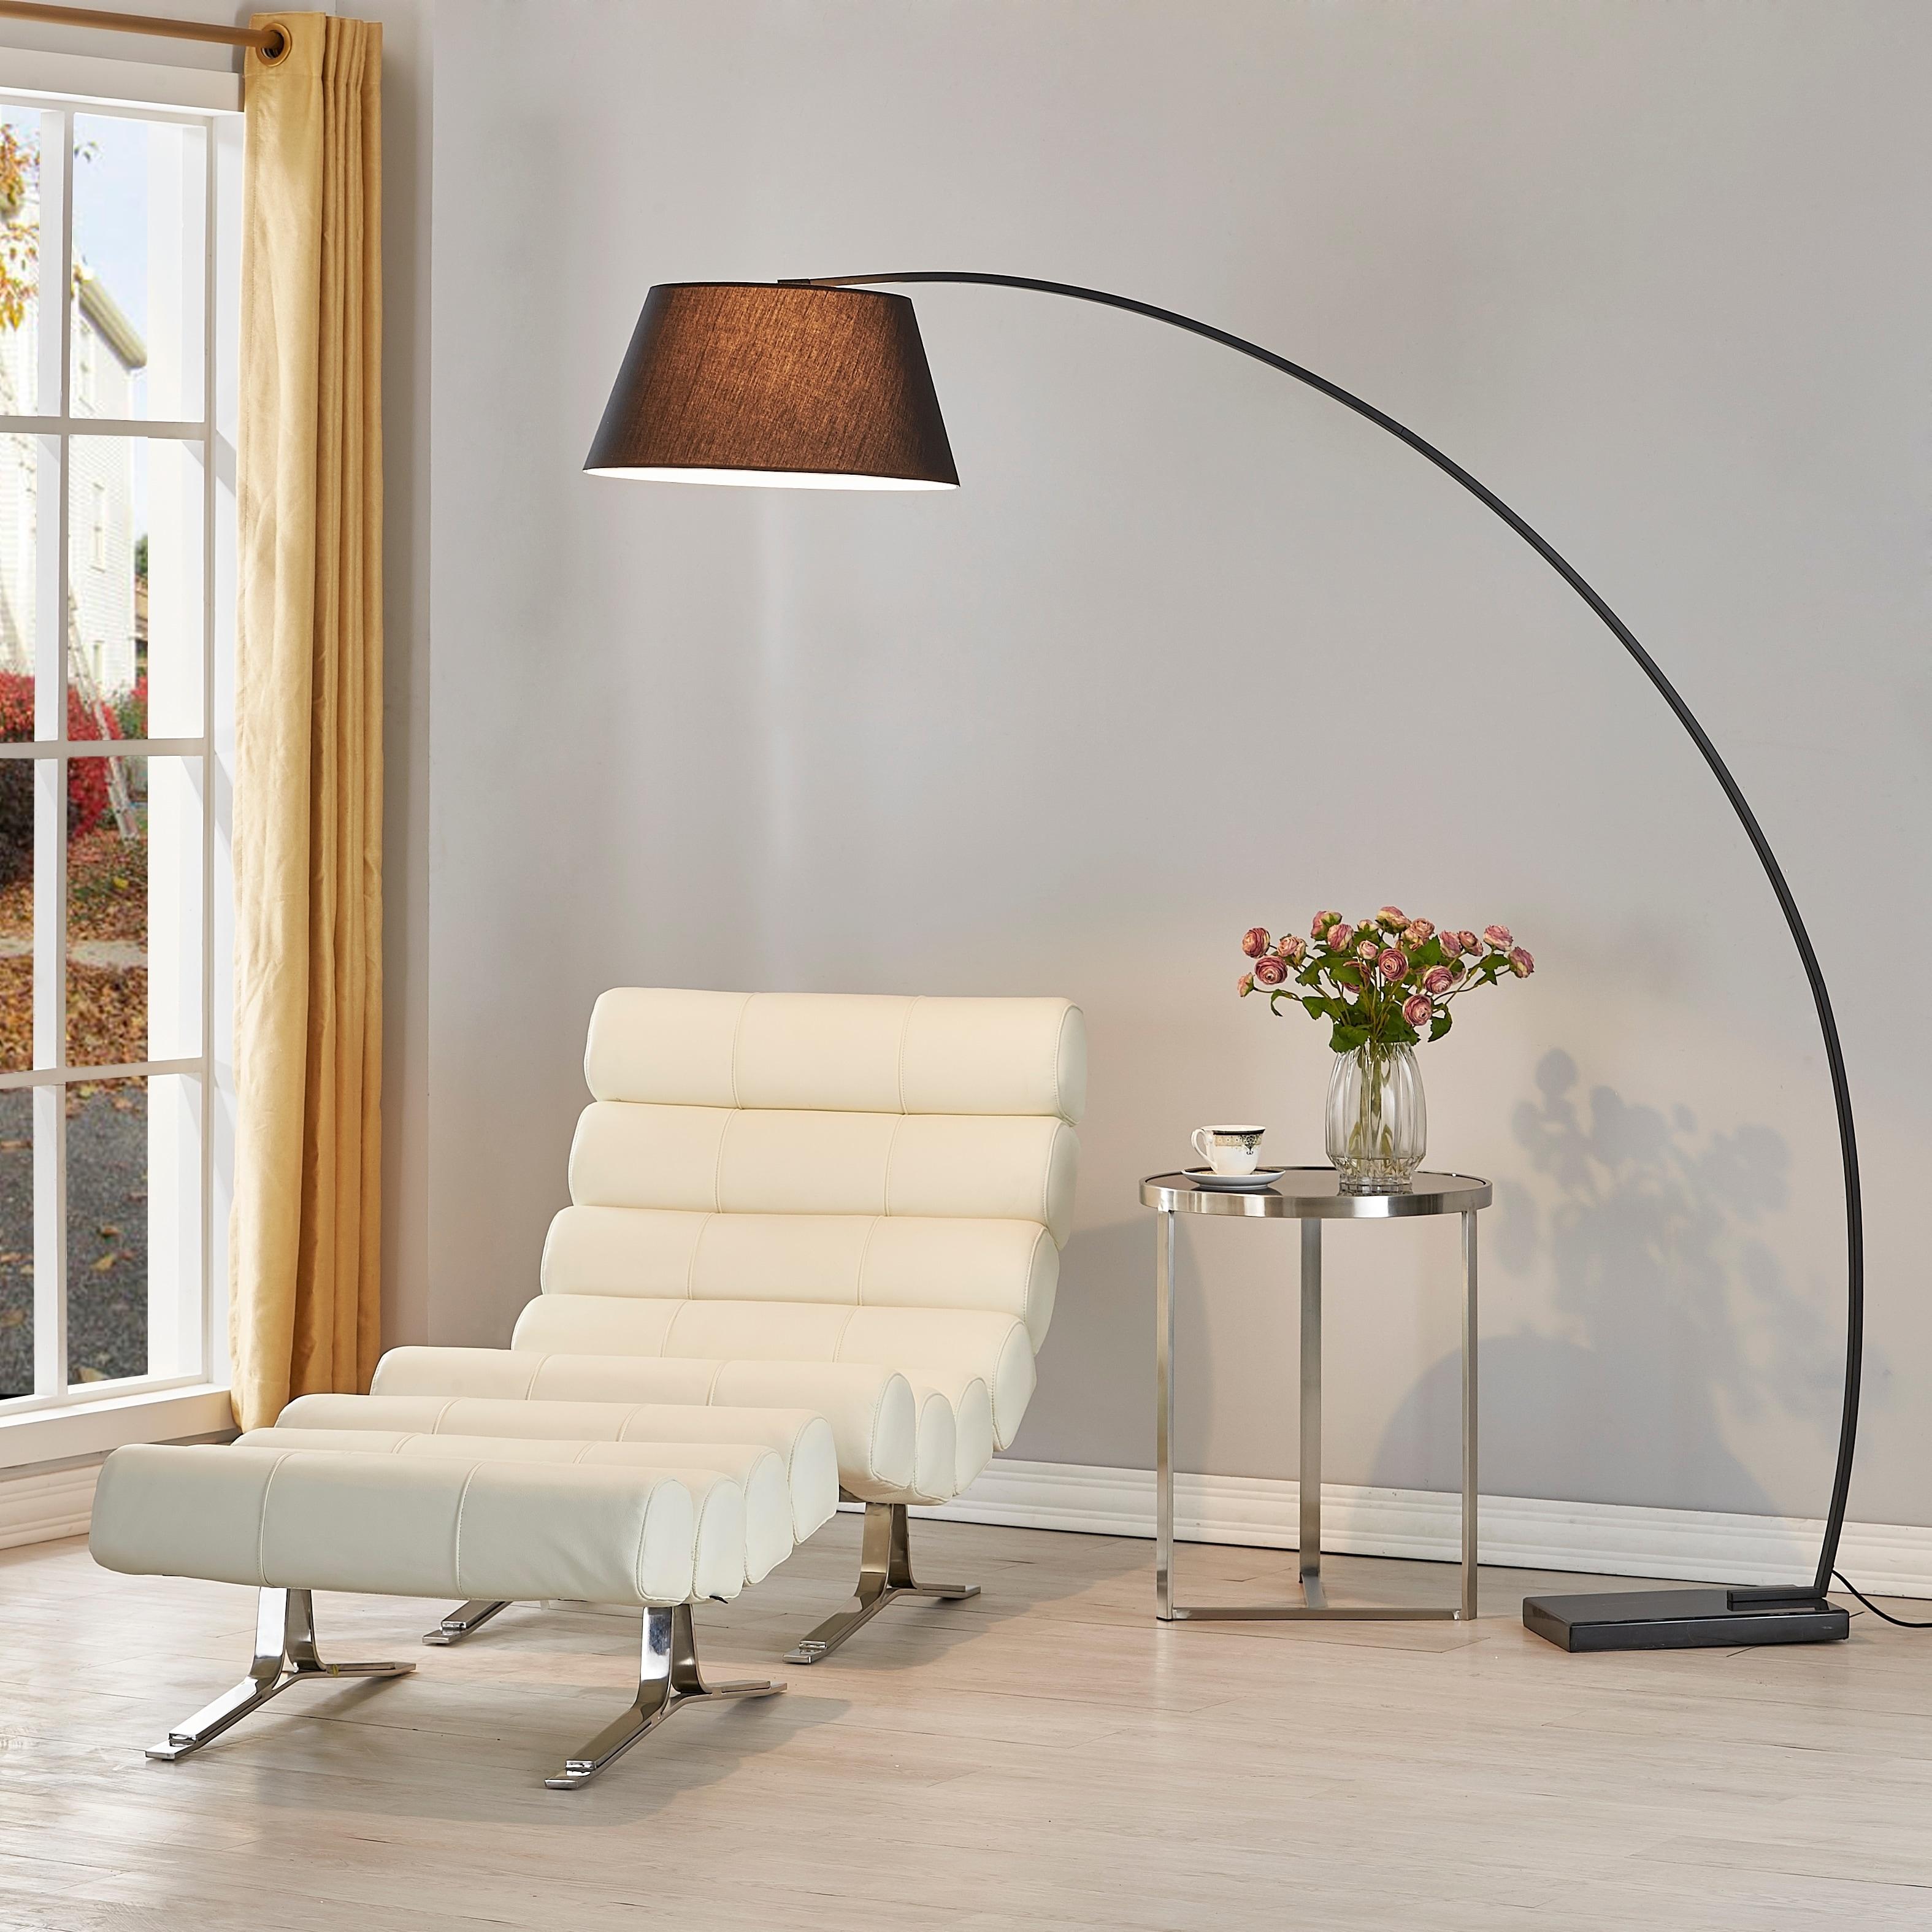 Light Society Daya Arc Floor Lamp